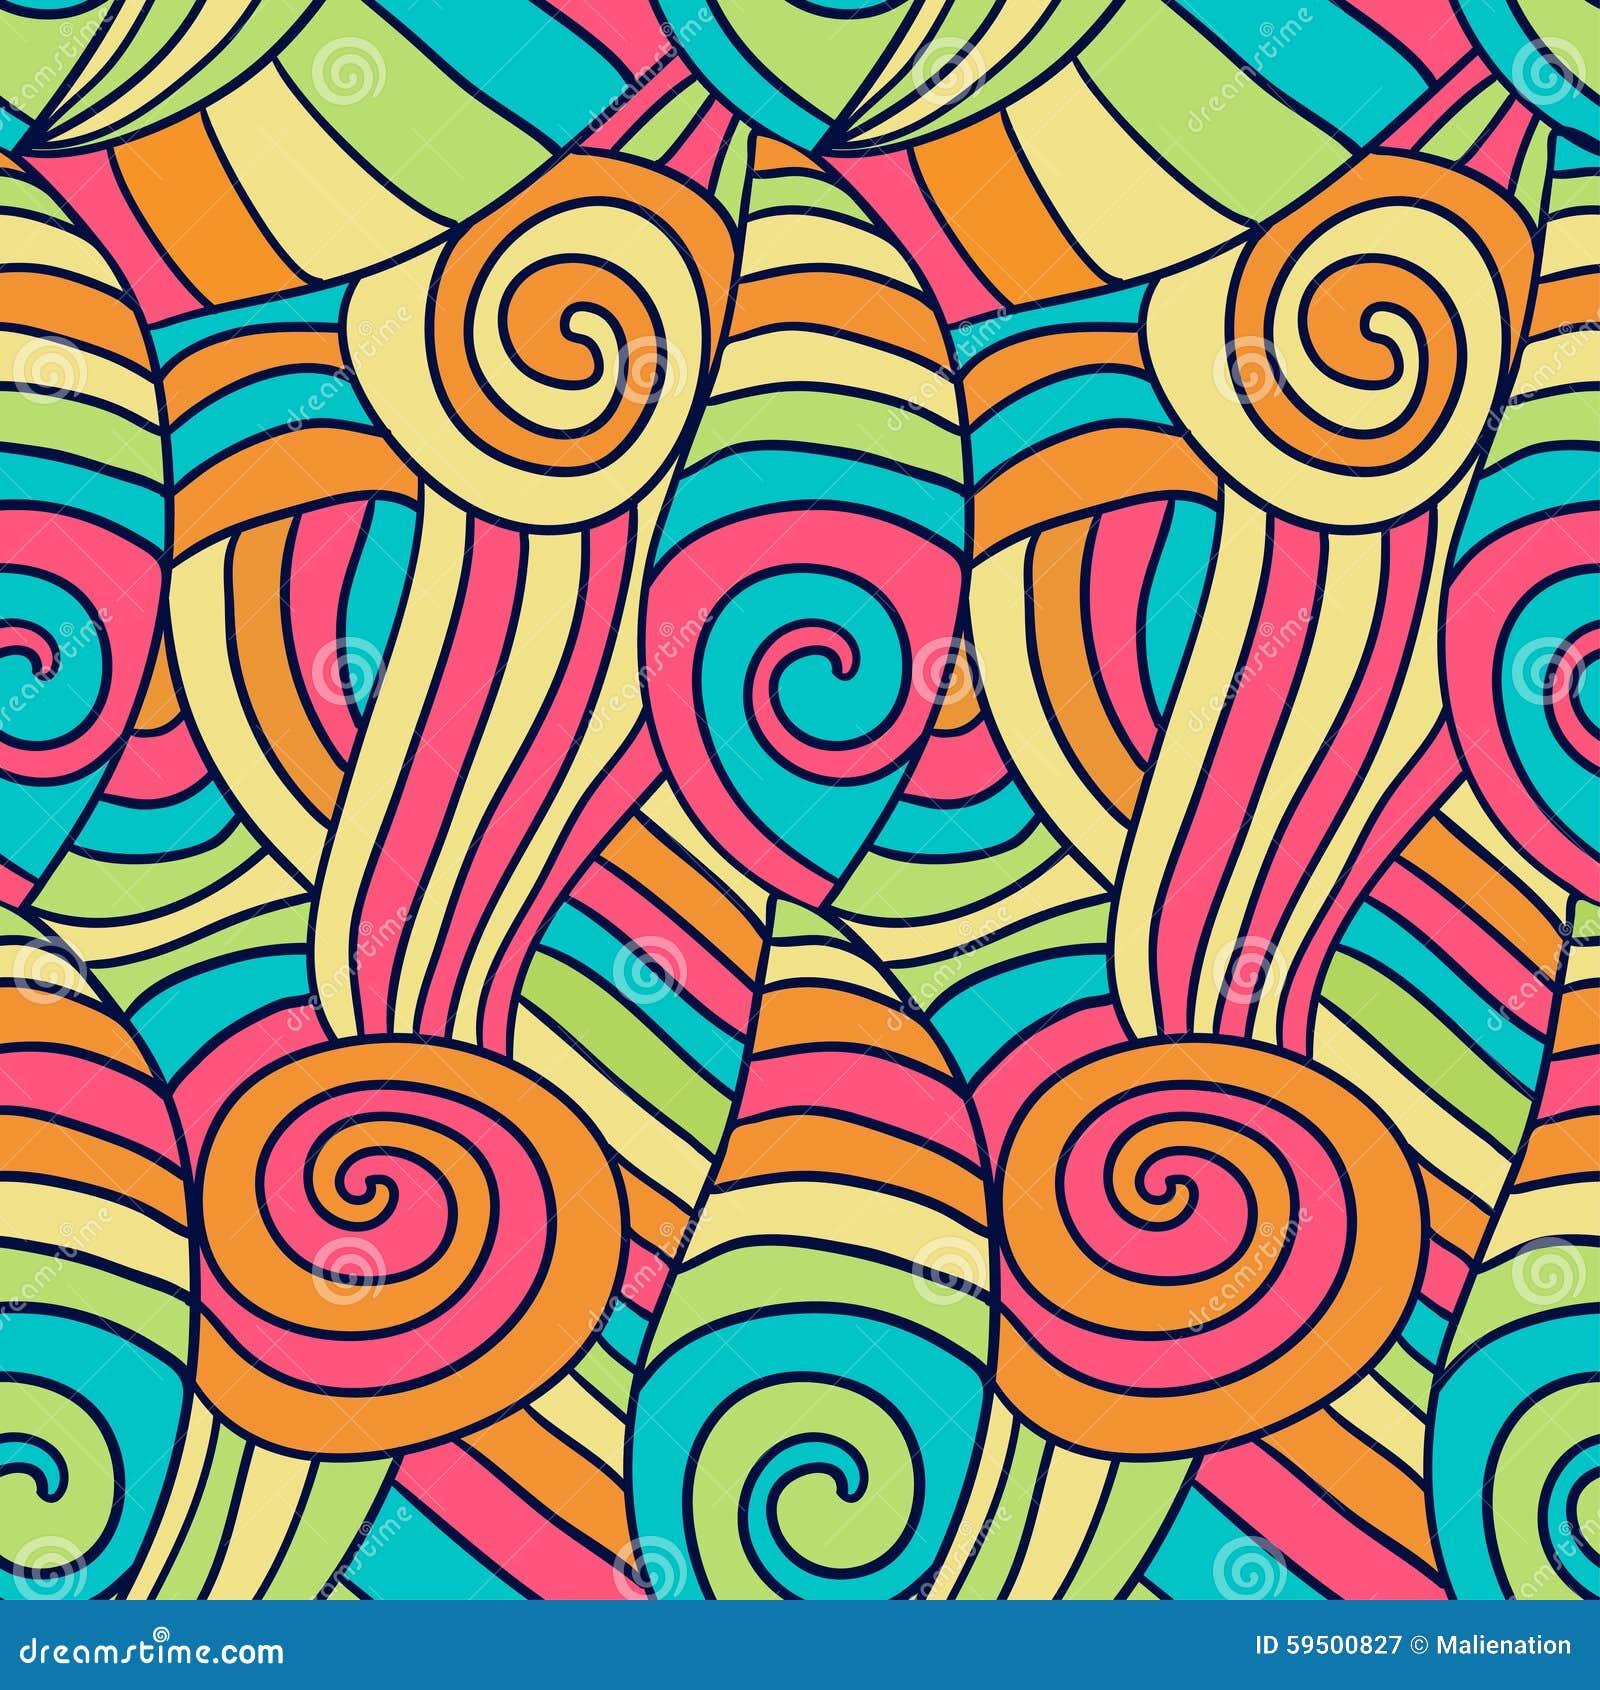 Colorfu Abstract Waves Pattern Hand Drawn Spiral Wavy